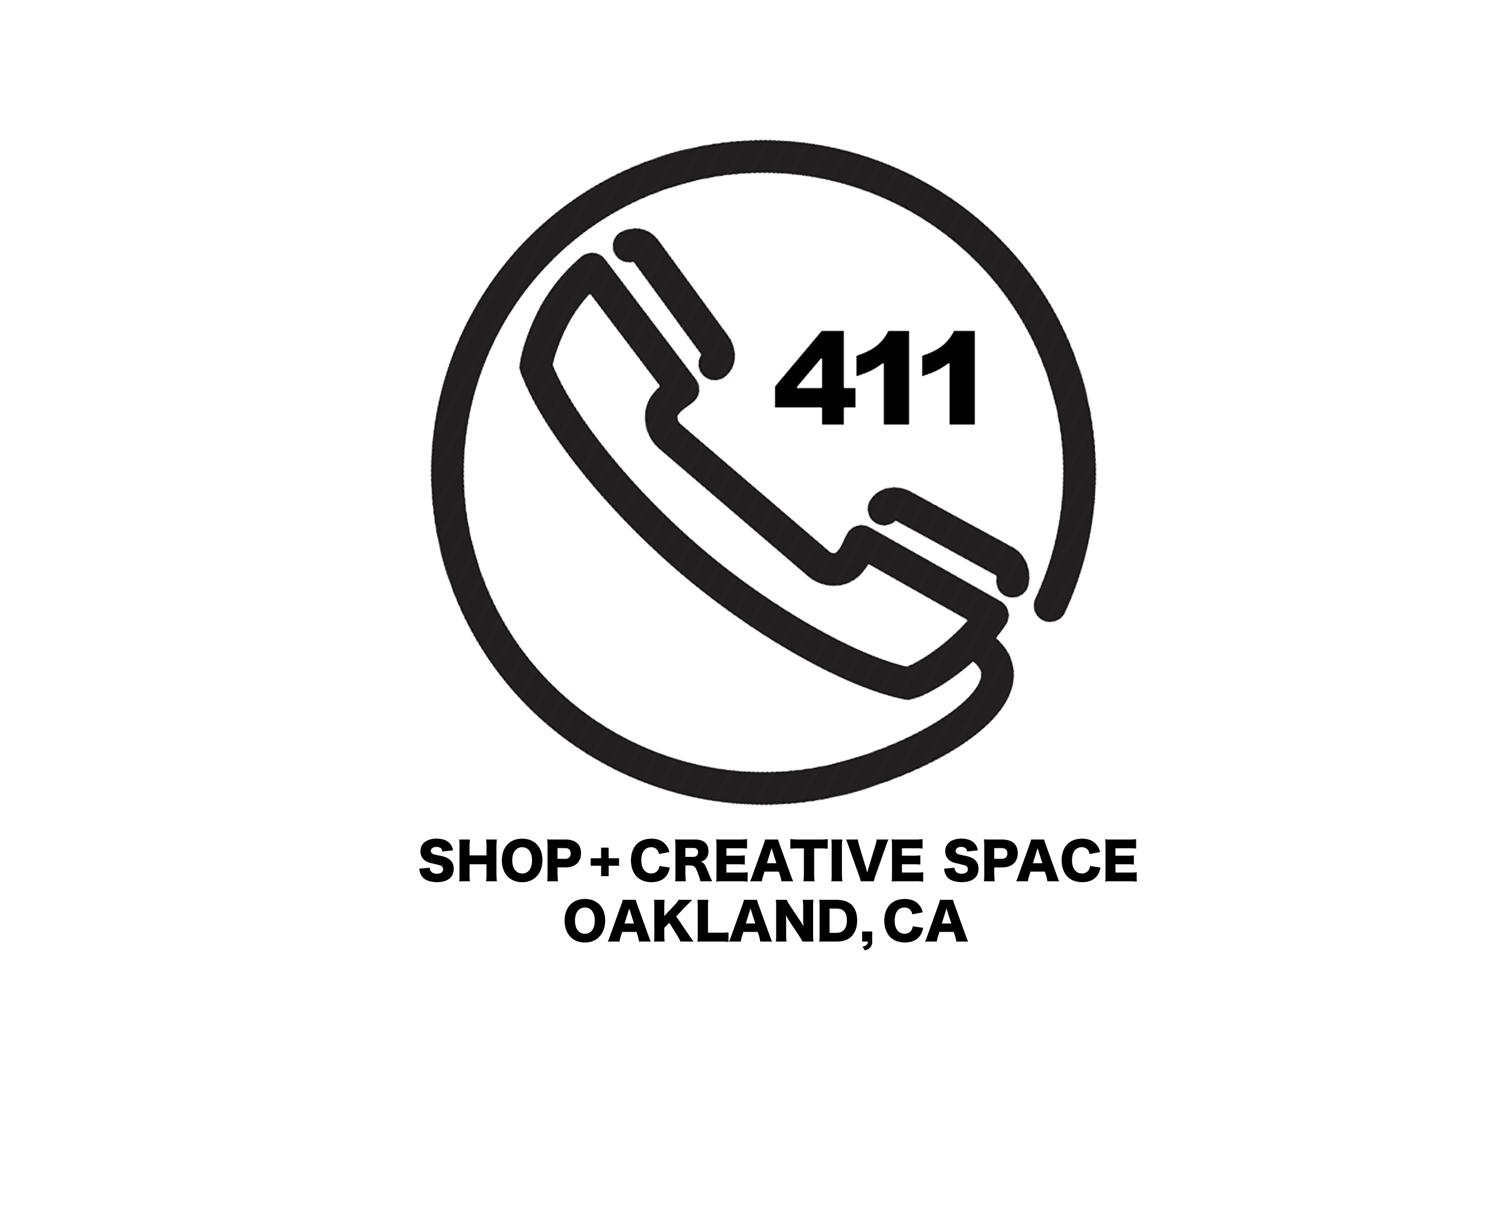 411 Oakland